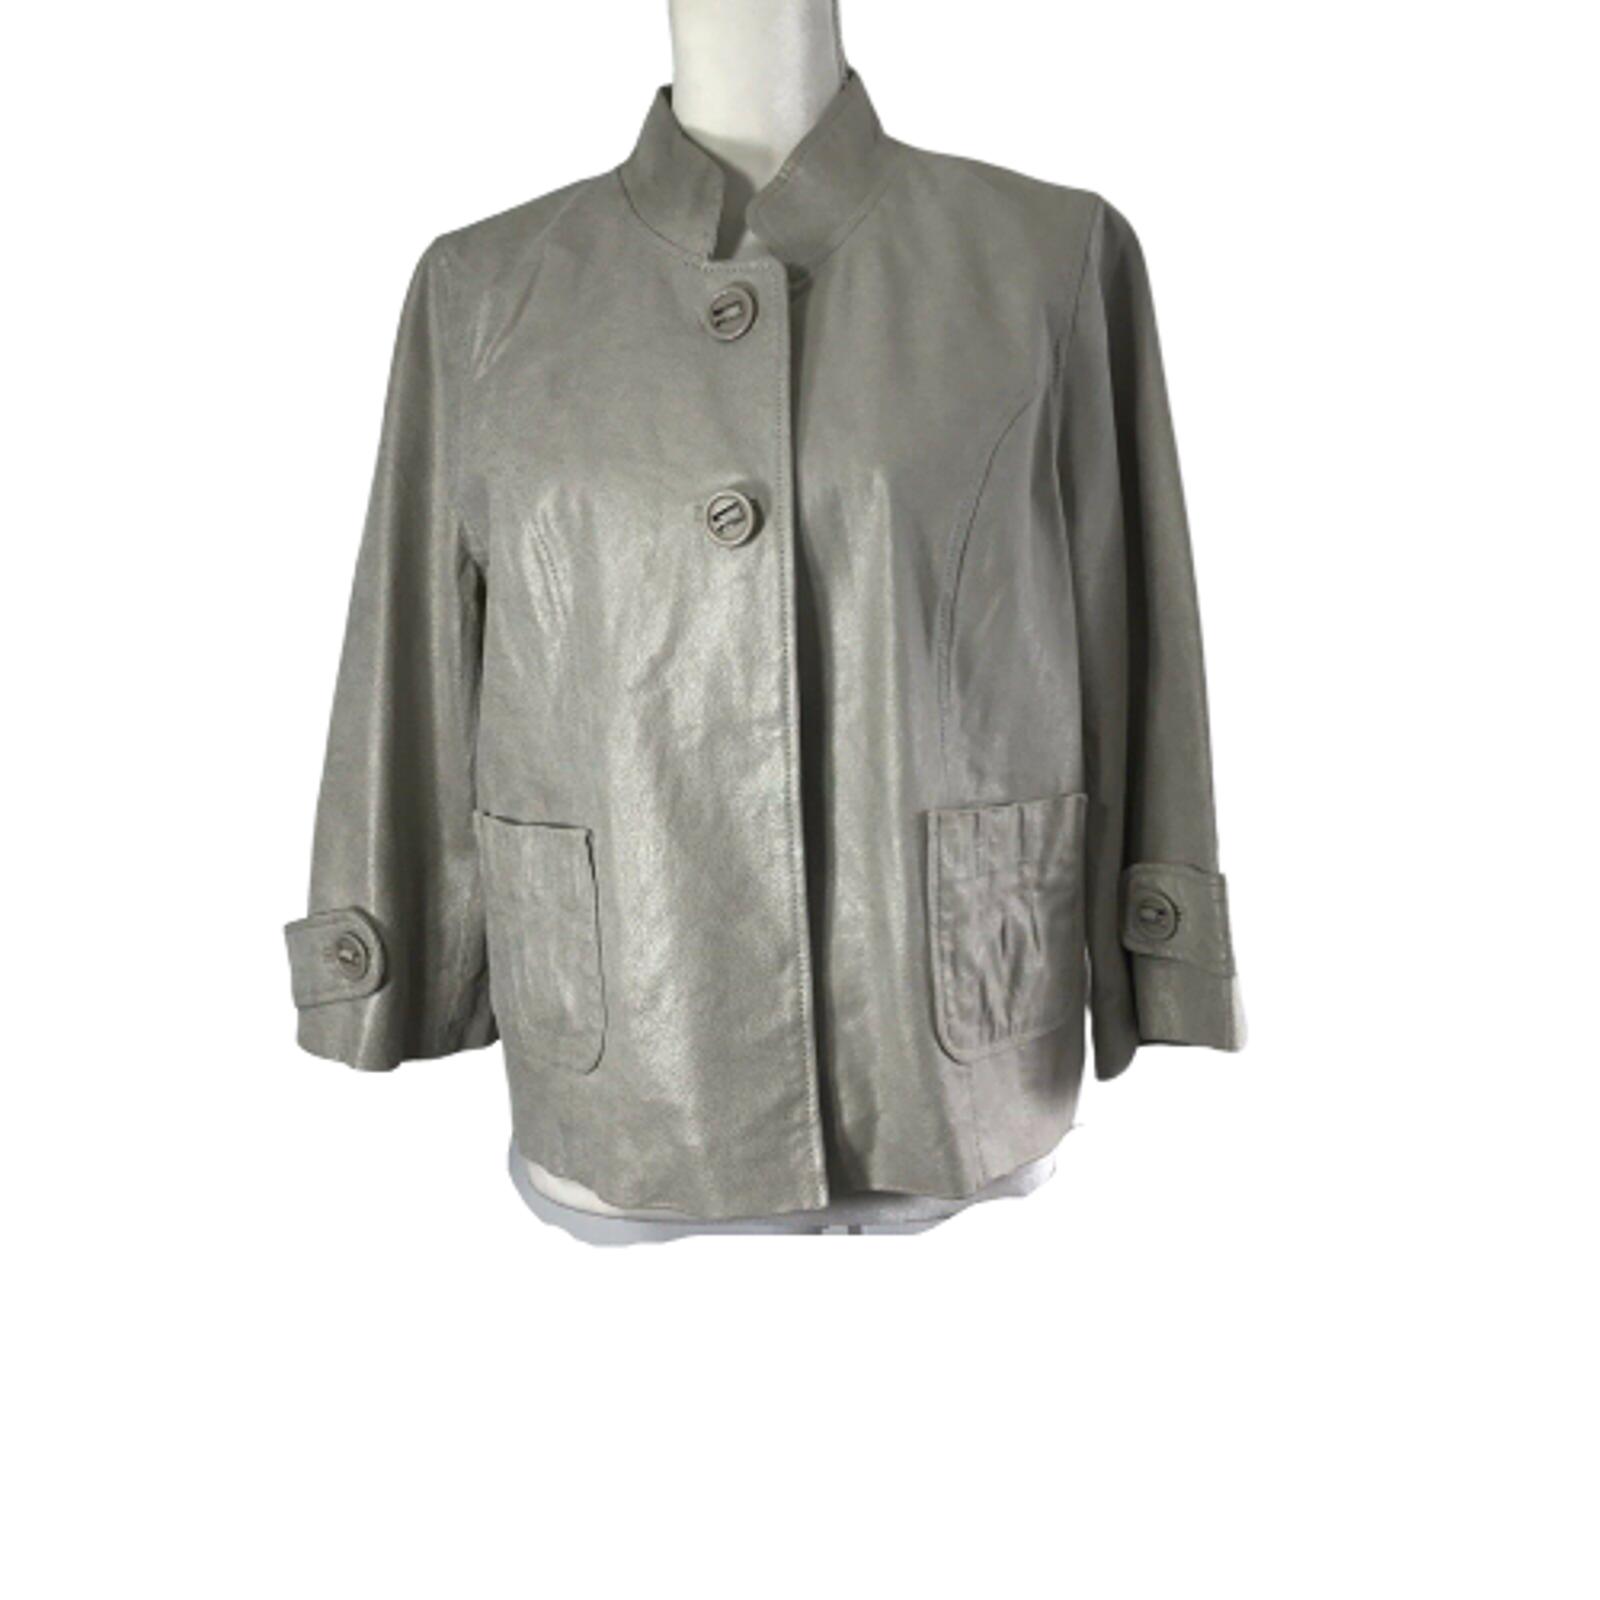 Bernardo Genuine Leather Jacket Womens Large Shiny Gray Button Down